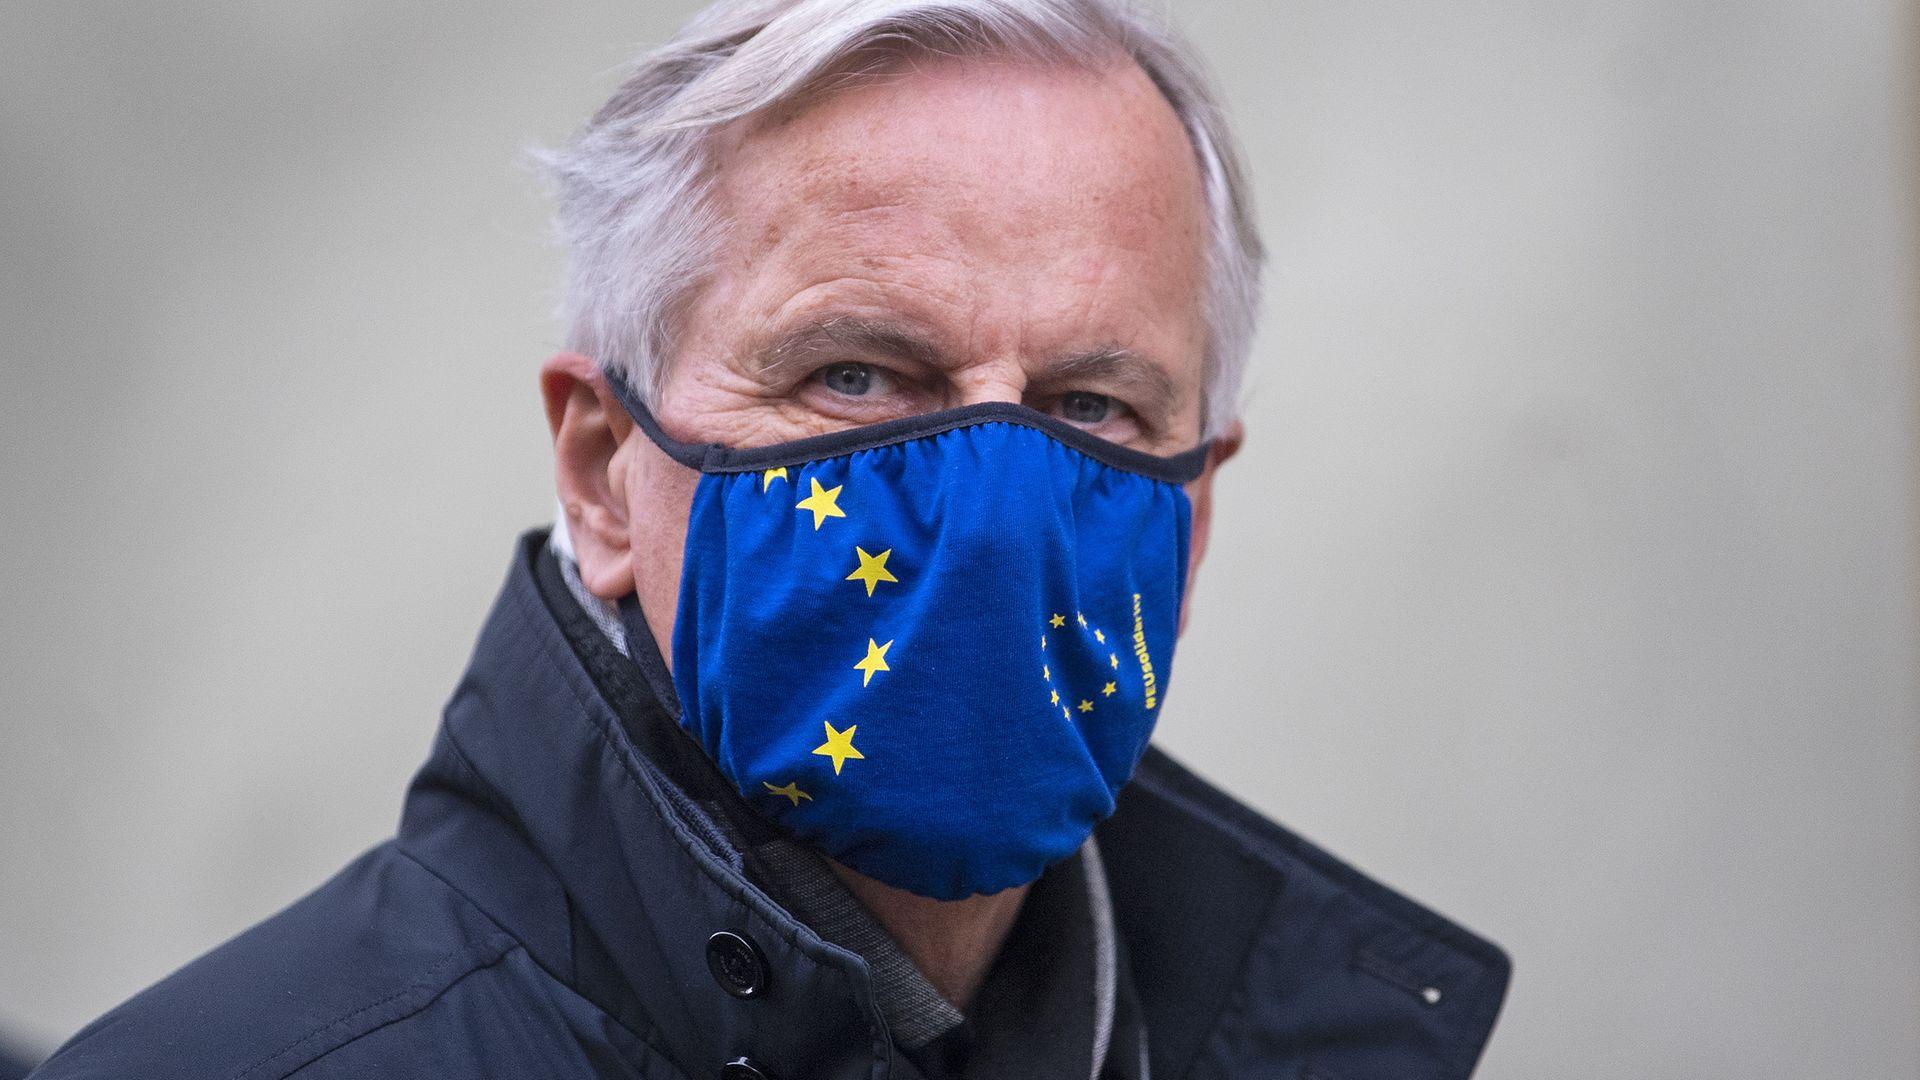 EU's chief negotiator Michel Barnier during talks on a post-Brexit trade deal - Credit: PA